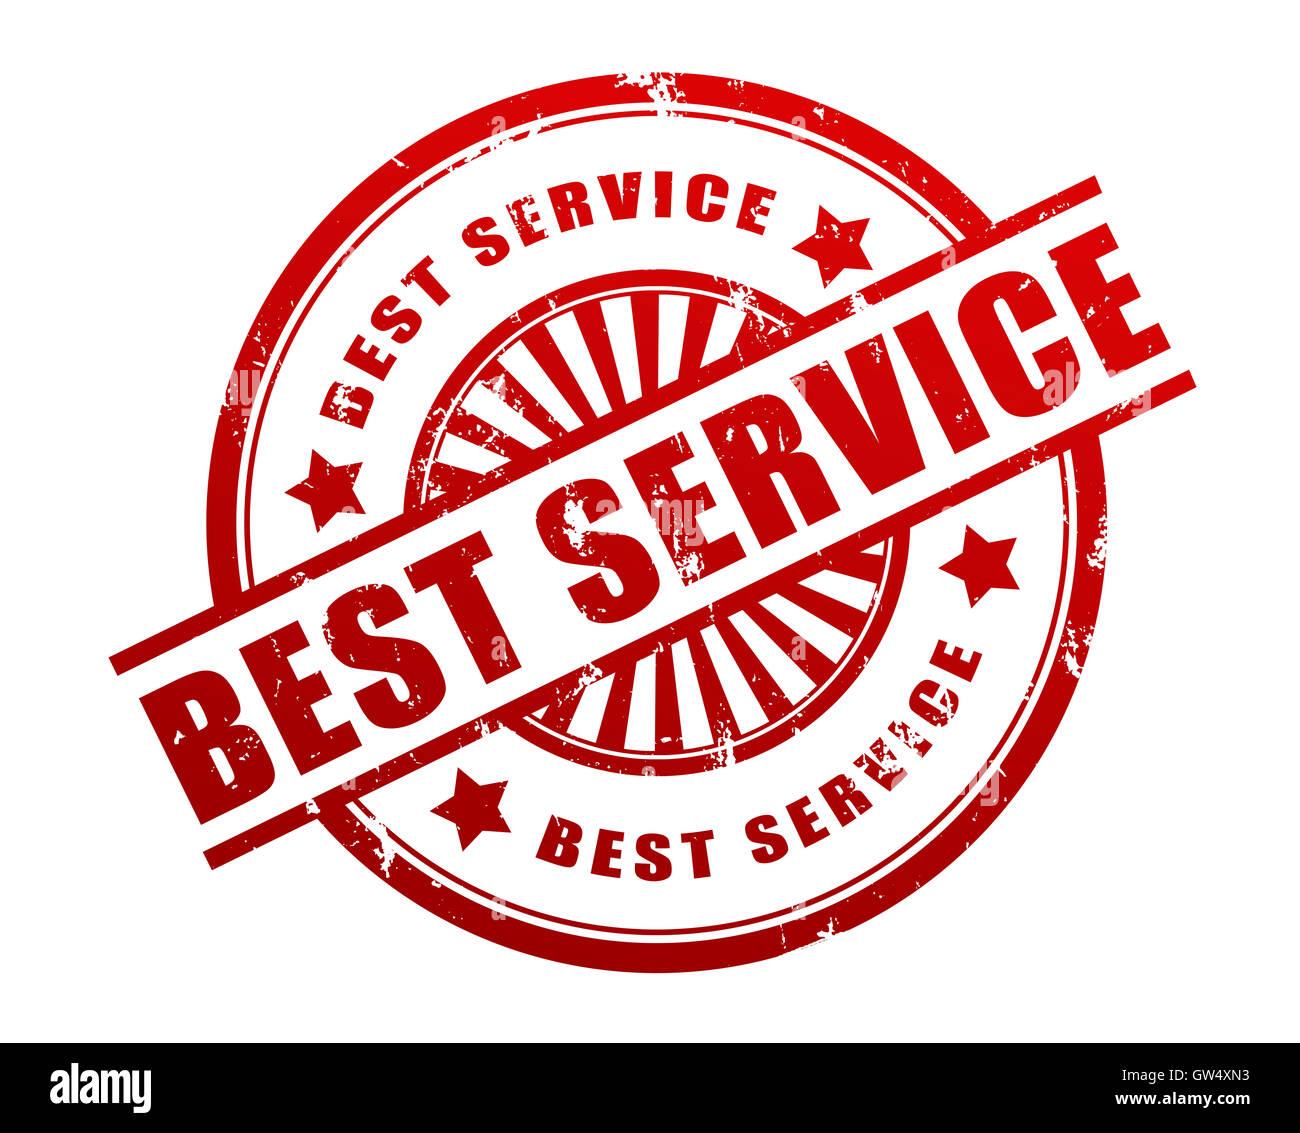 Bester Service Stockfotos & Bester Service Bilder Alamy